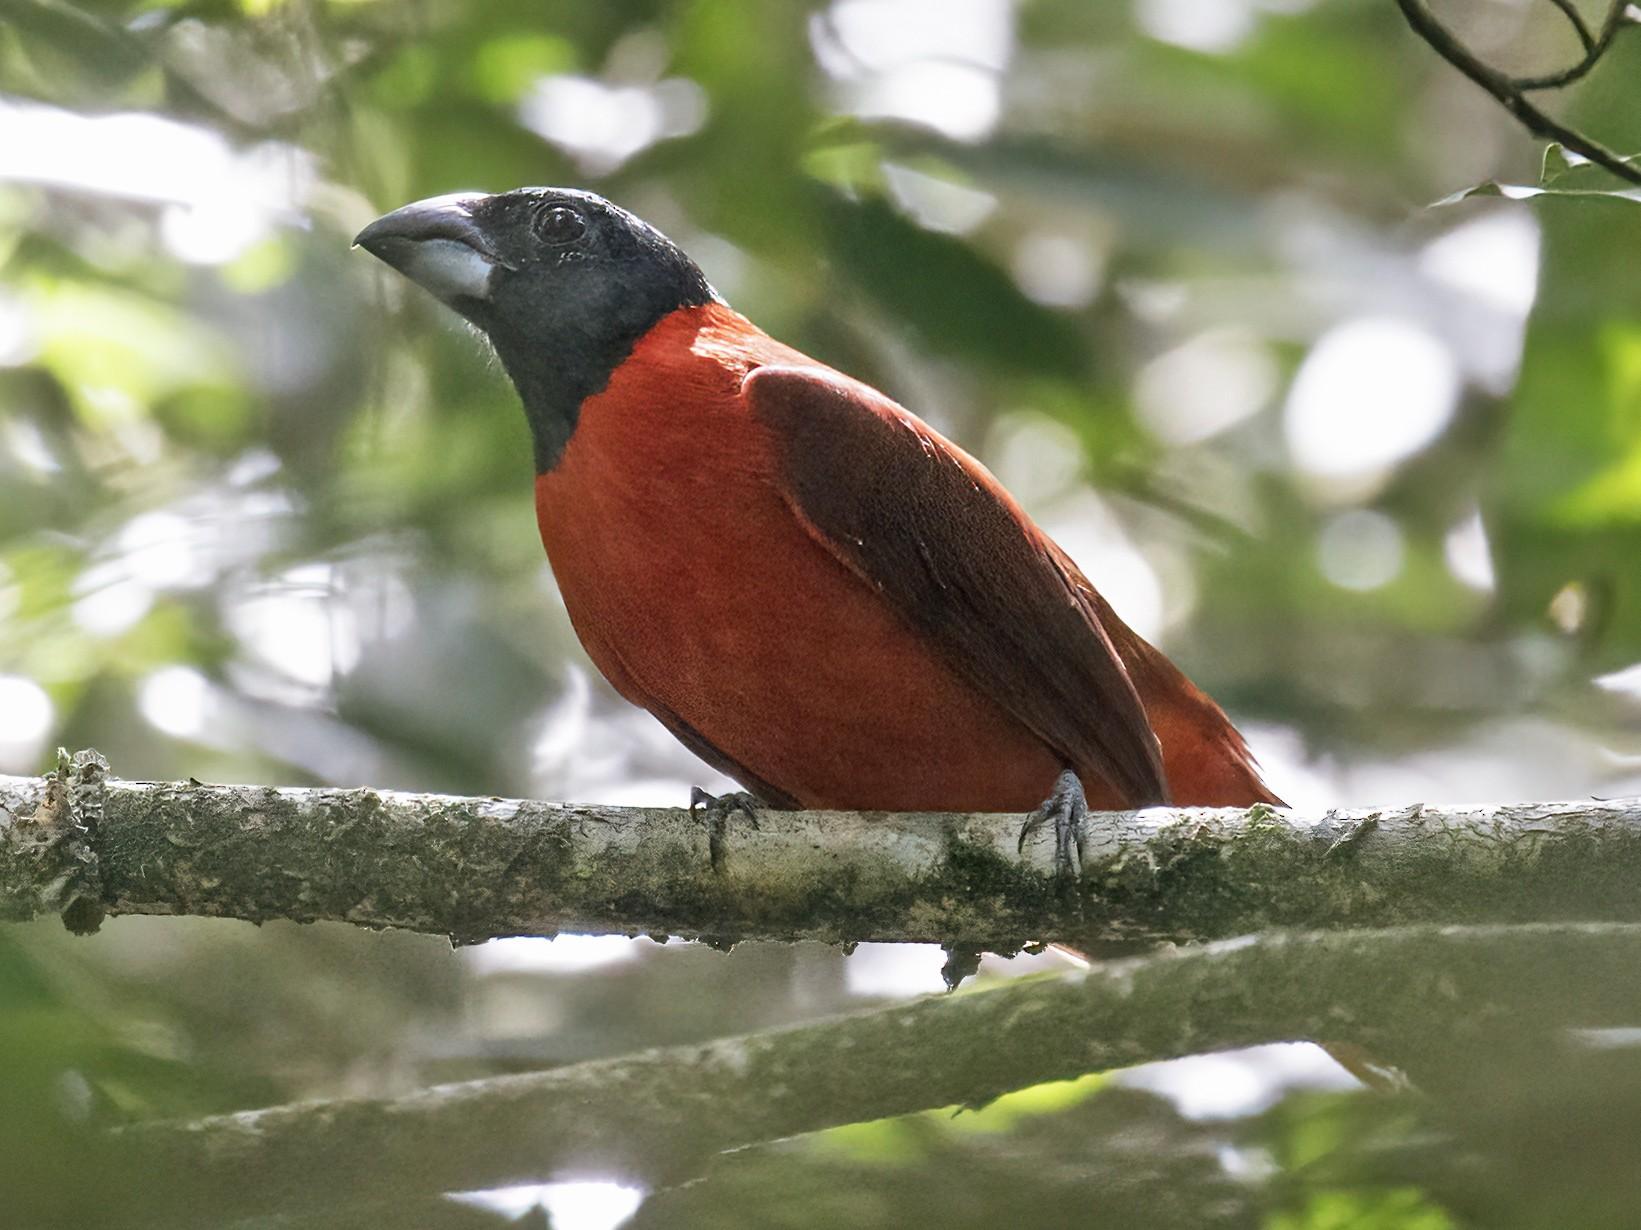 Red-and-black Grosbeak - Nick Athanas